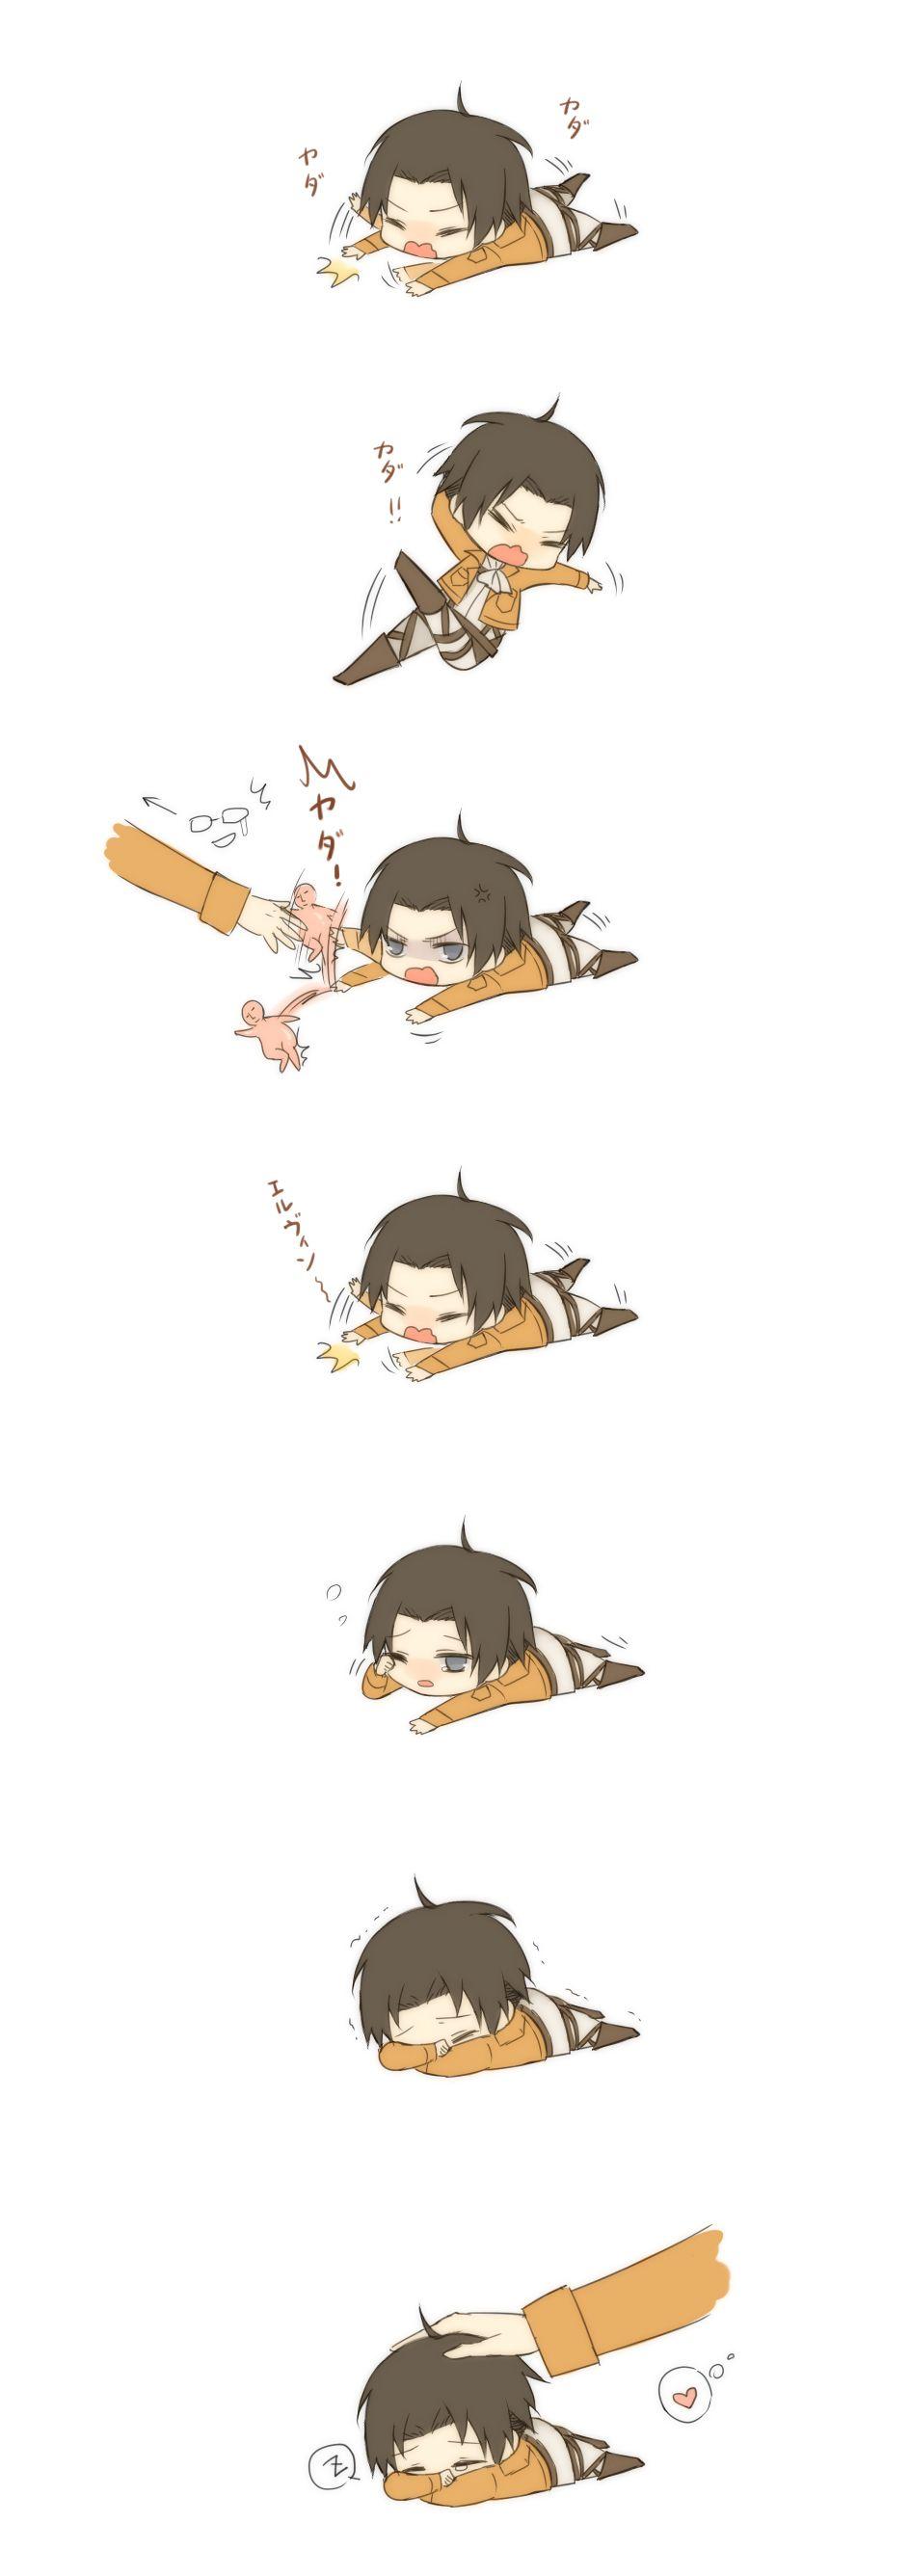 Melting A Frozen Heart ~ Levi Ackerman x OC ~ Attack on Titan/Shingeki no Kyojin - Chapter 5: It's All Okay Now